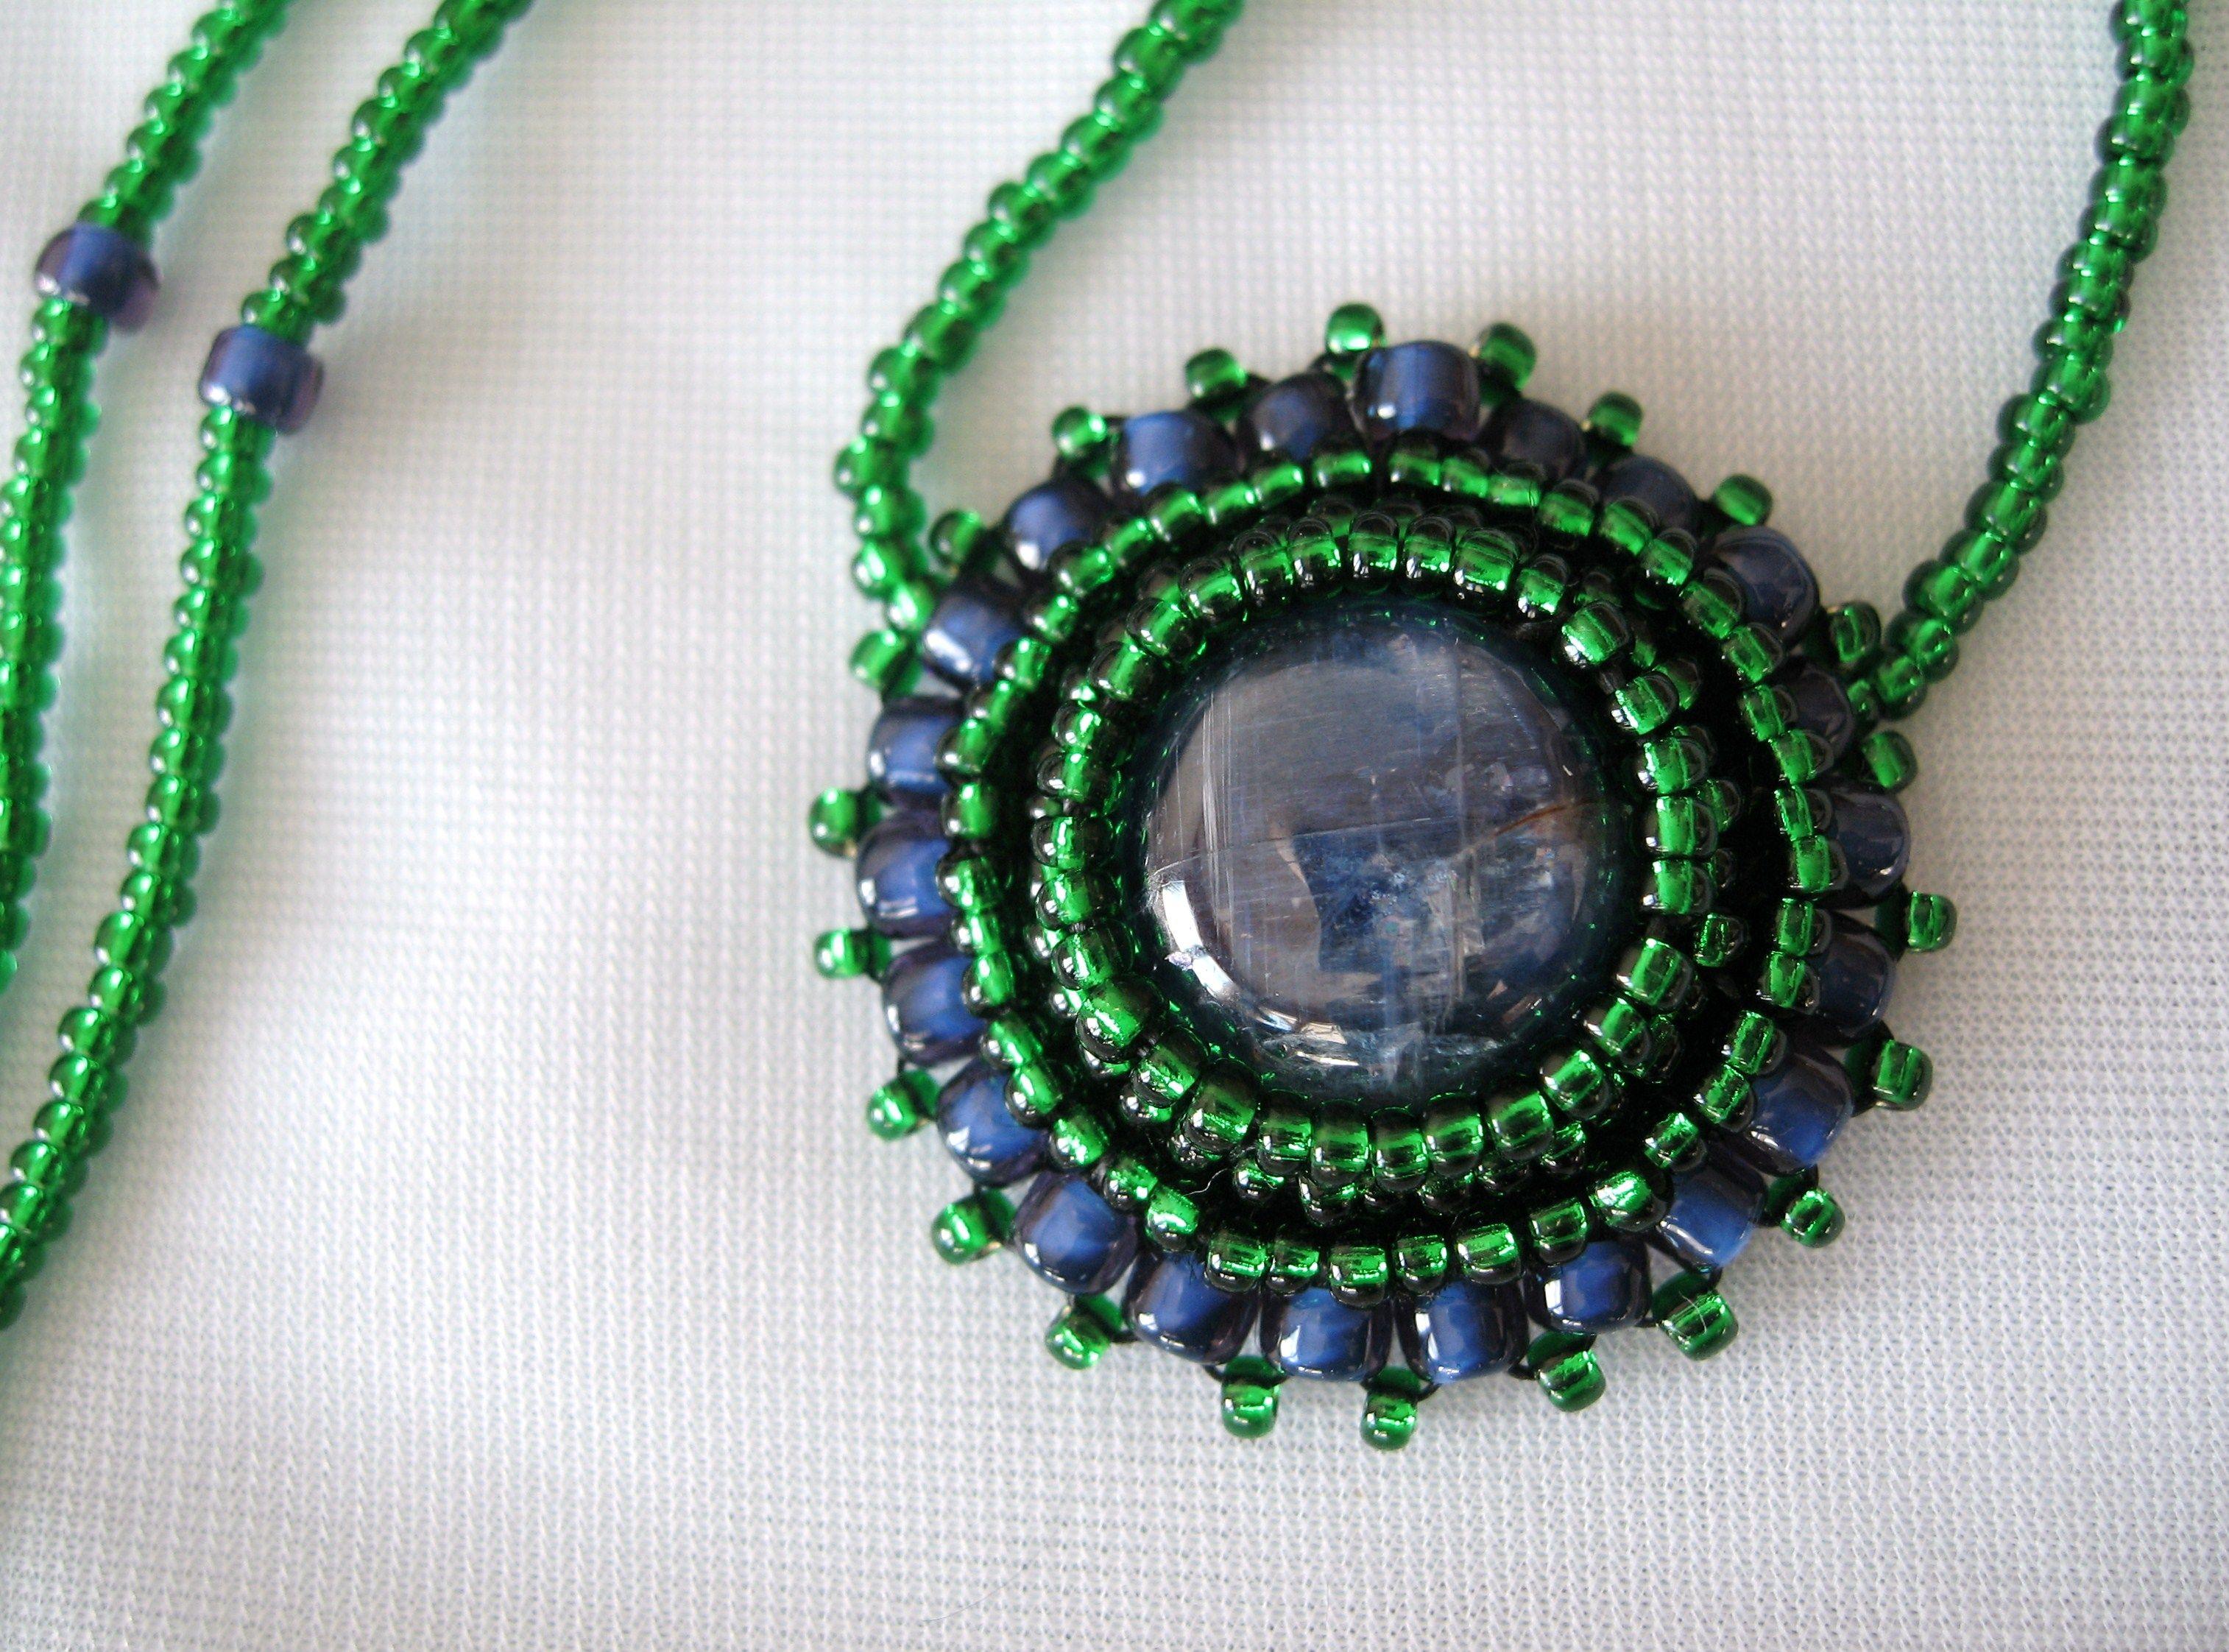 Iolith pendant